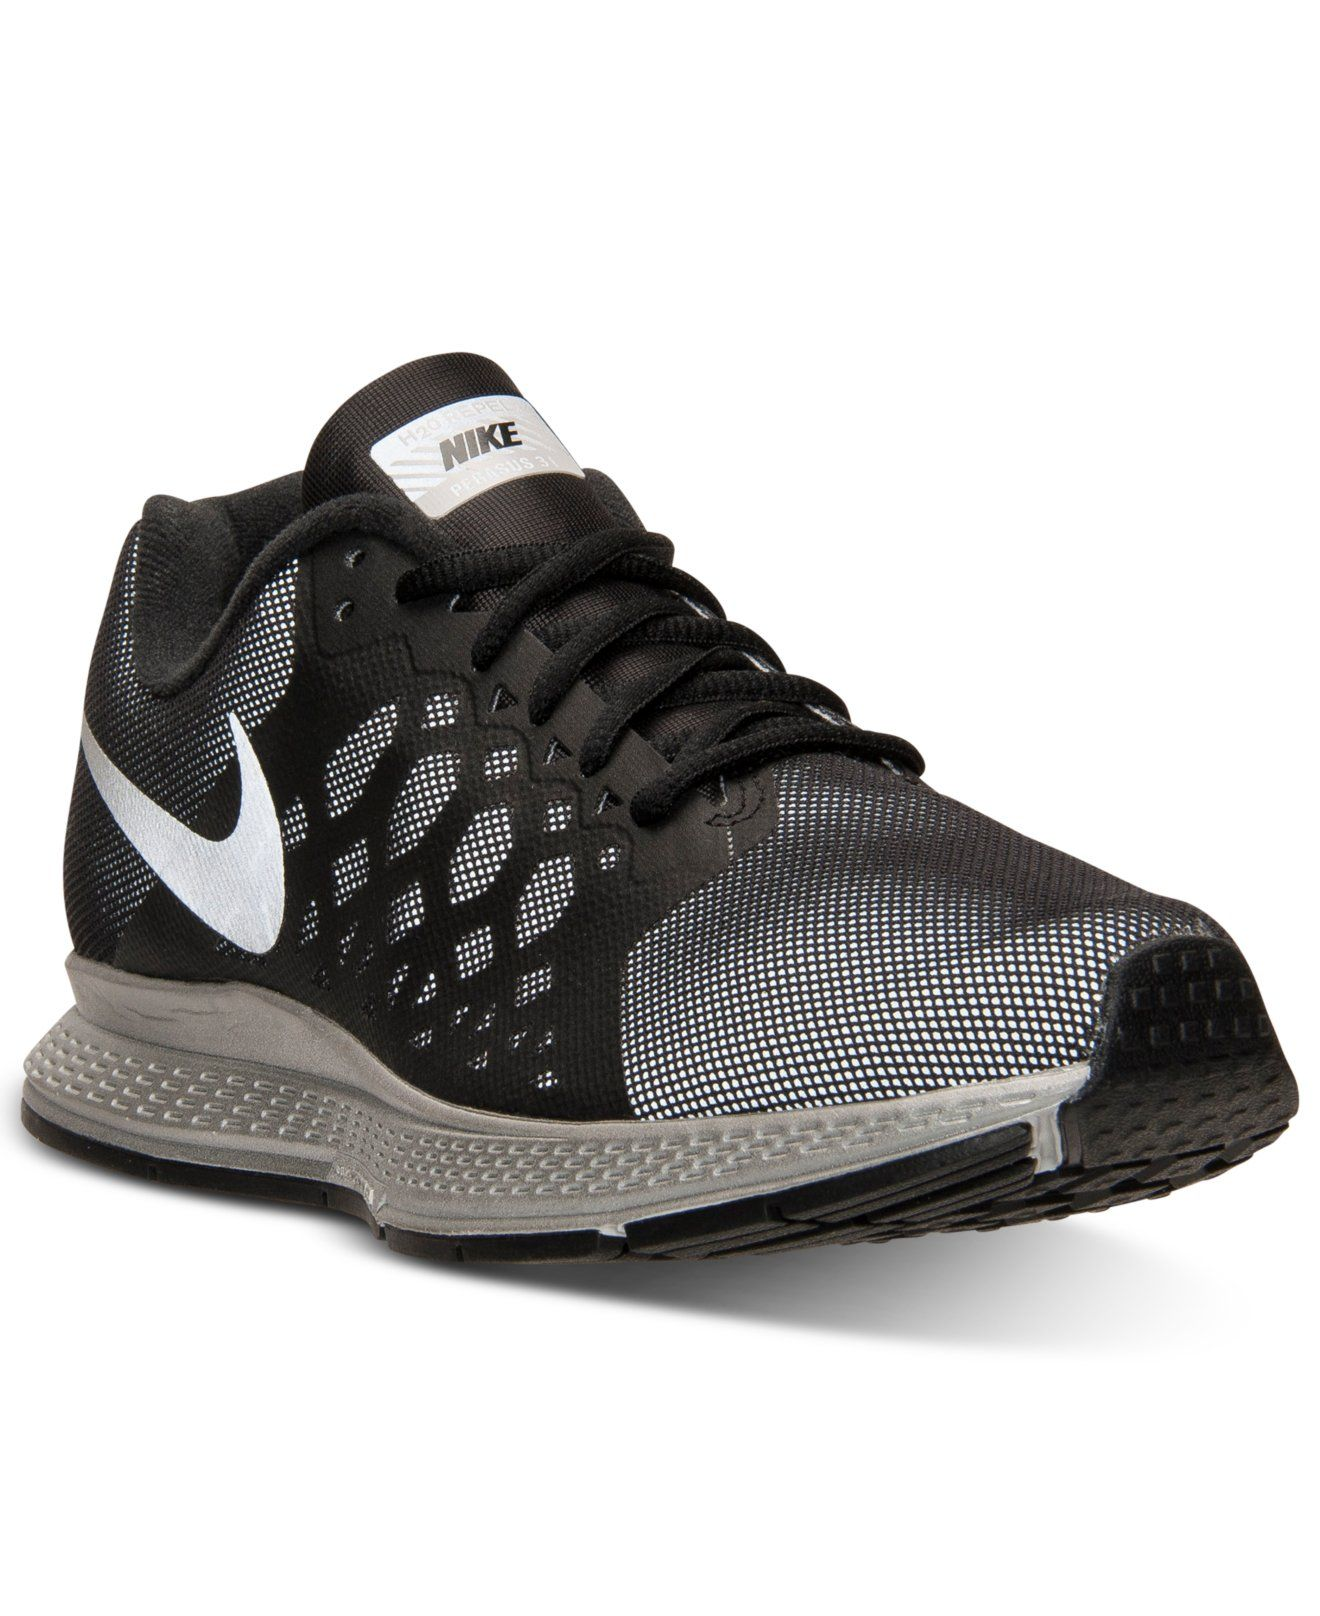 Nike Women's Zoom Pegasus 31 Flash Running Sneakers from